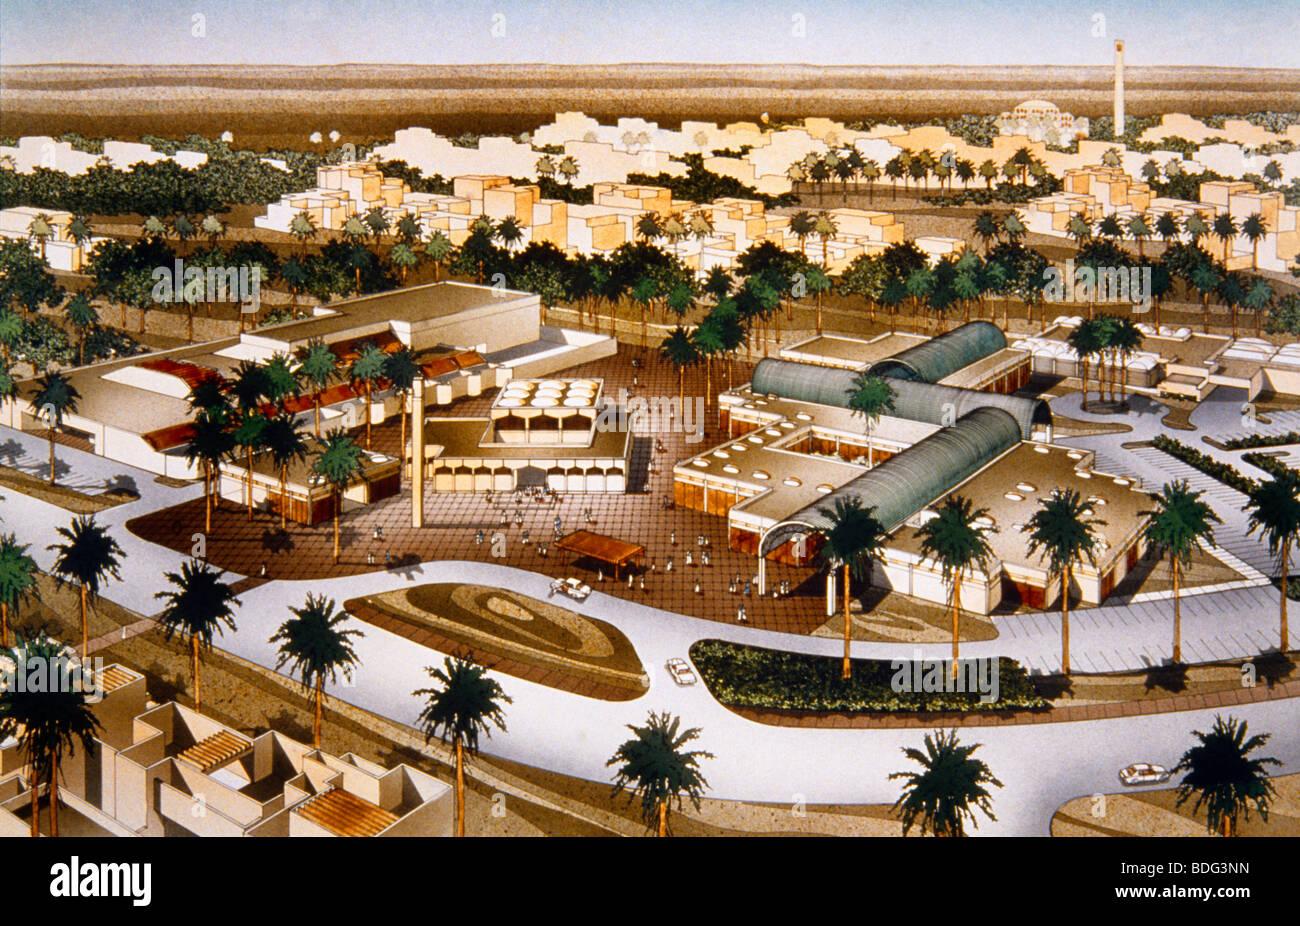 Hail Saudi Arabia Neighbourhood Centre Architects Plan - Stock Image